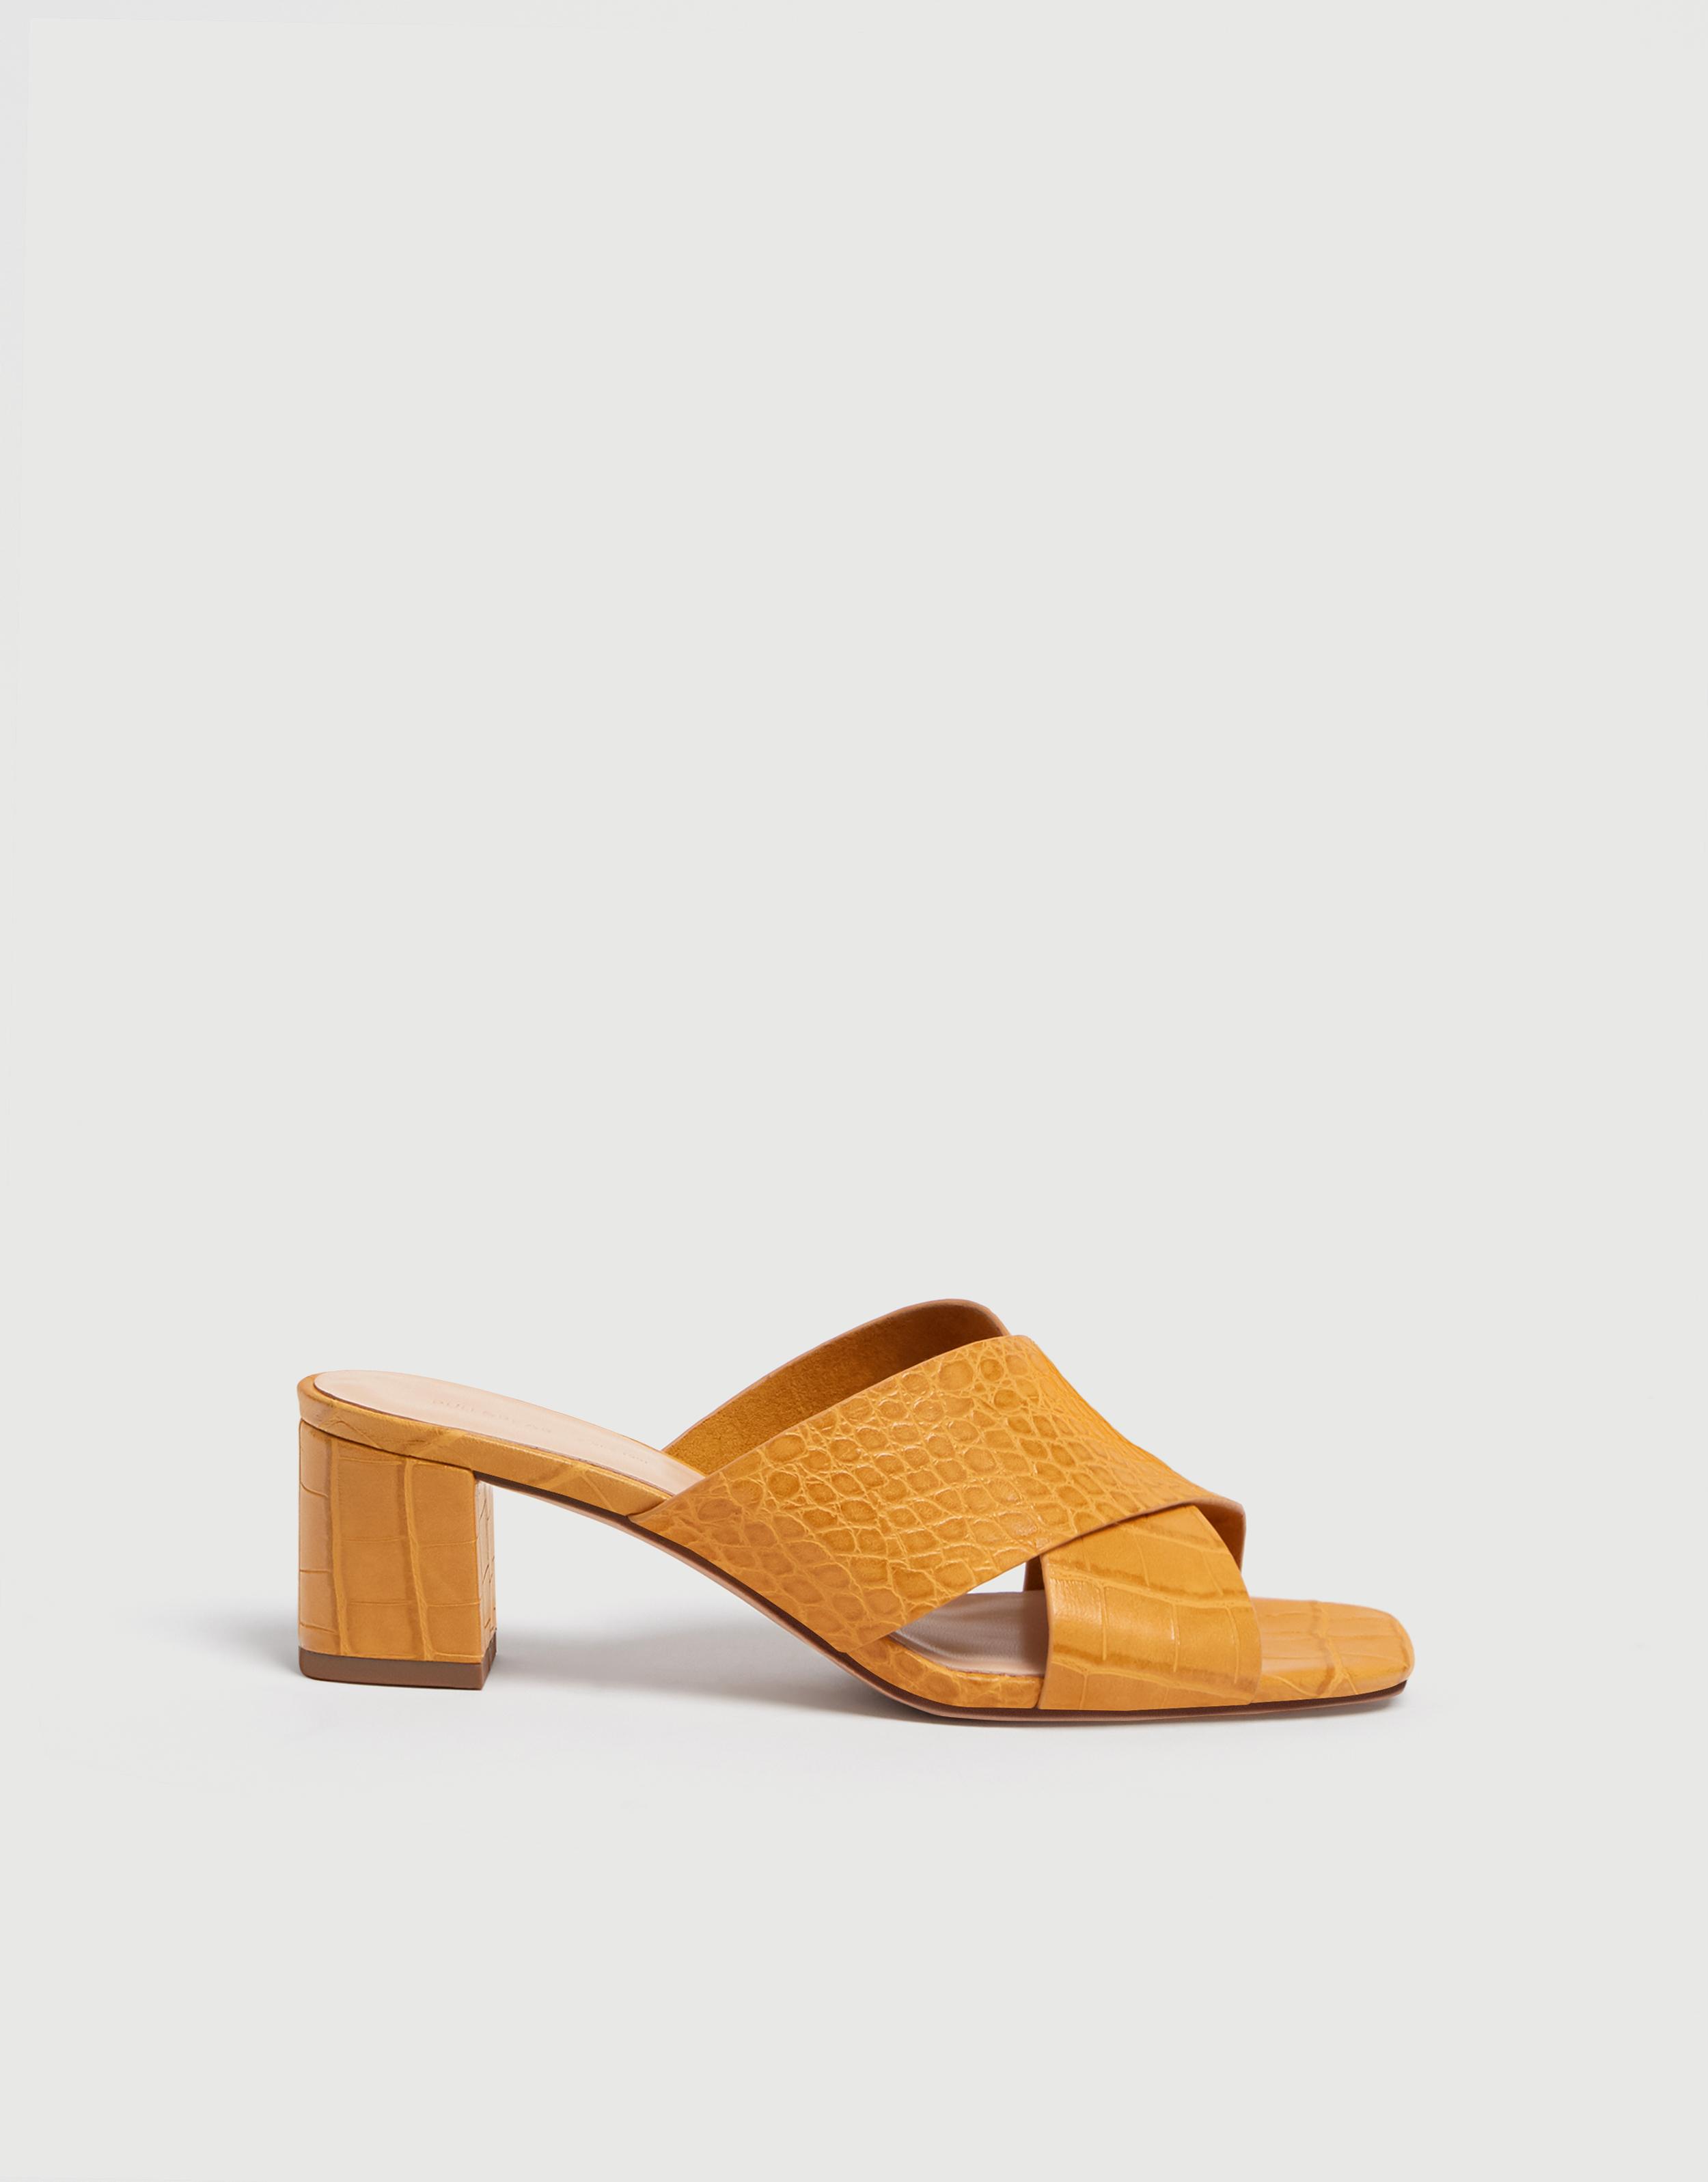 Mock Sandals Mule Mule Croc Mock Croc Heeled Sandals Heeled lF1Jc3KT